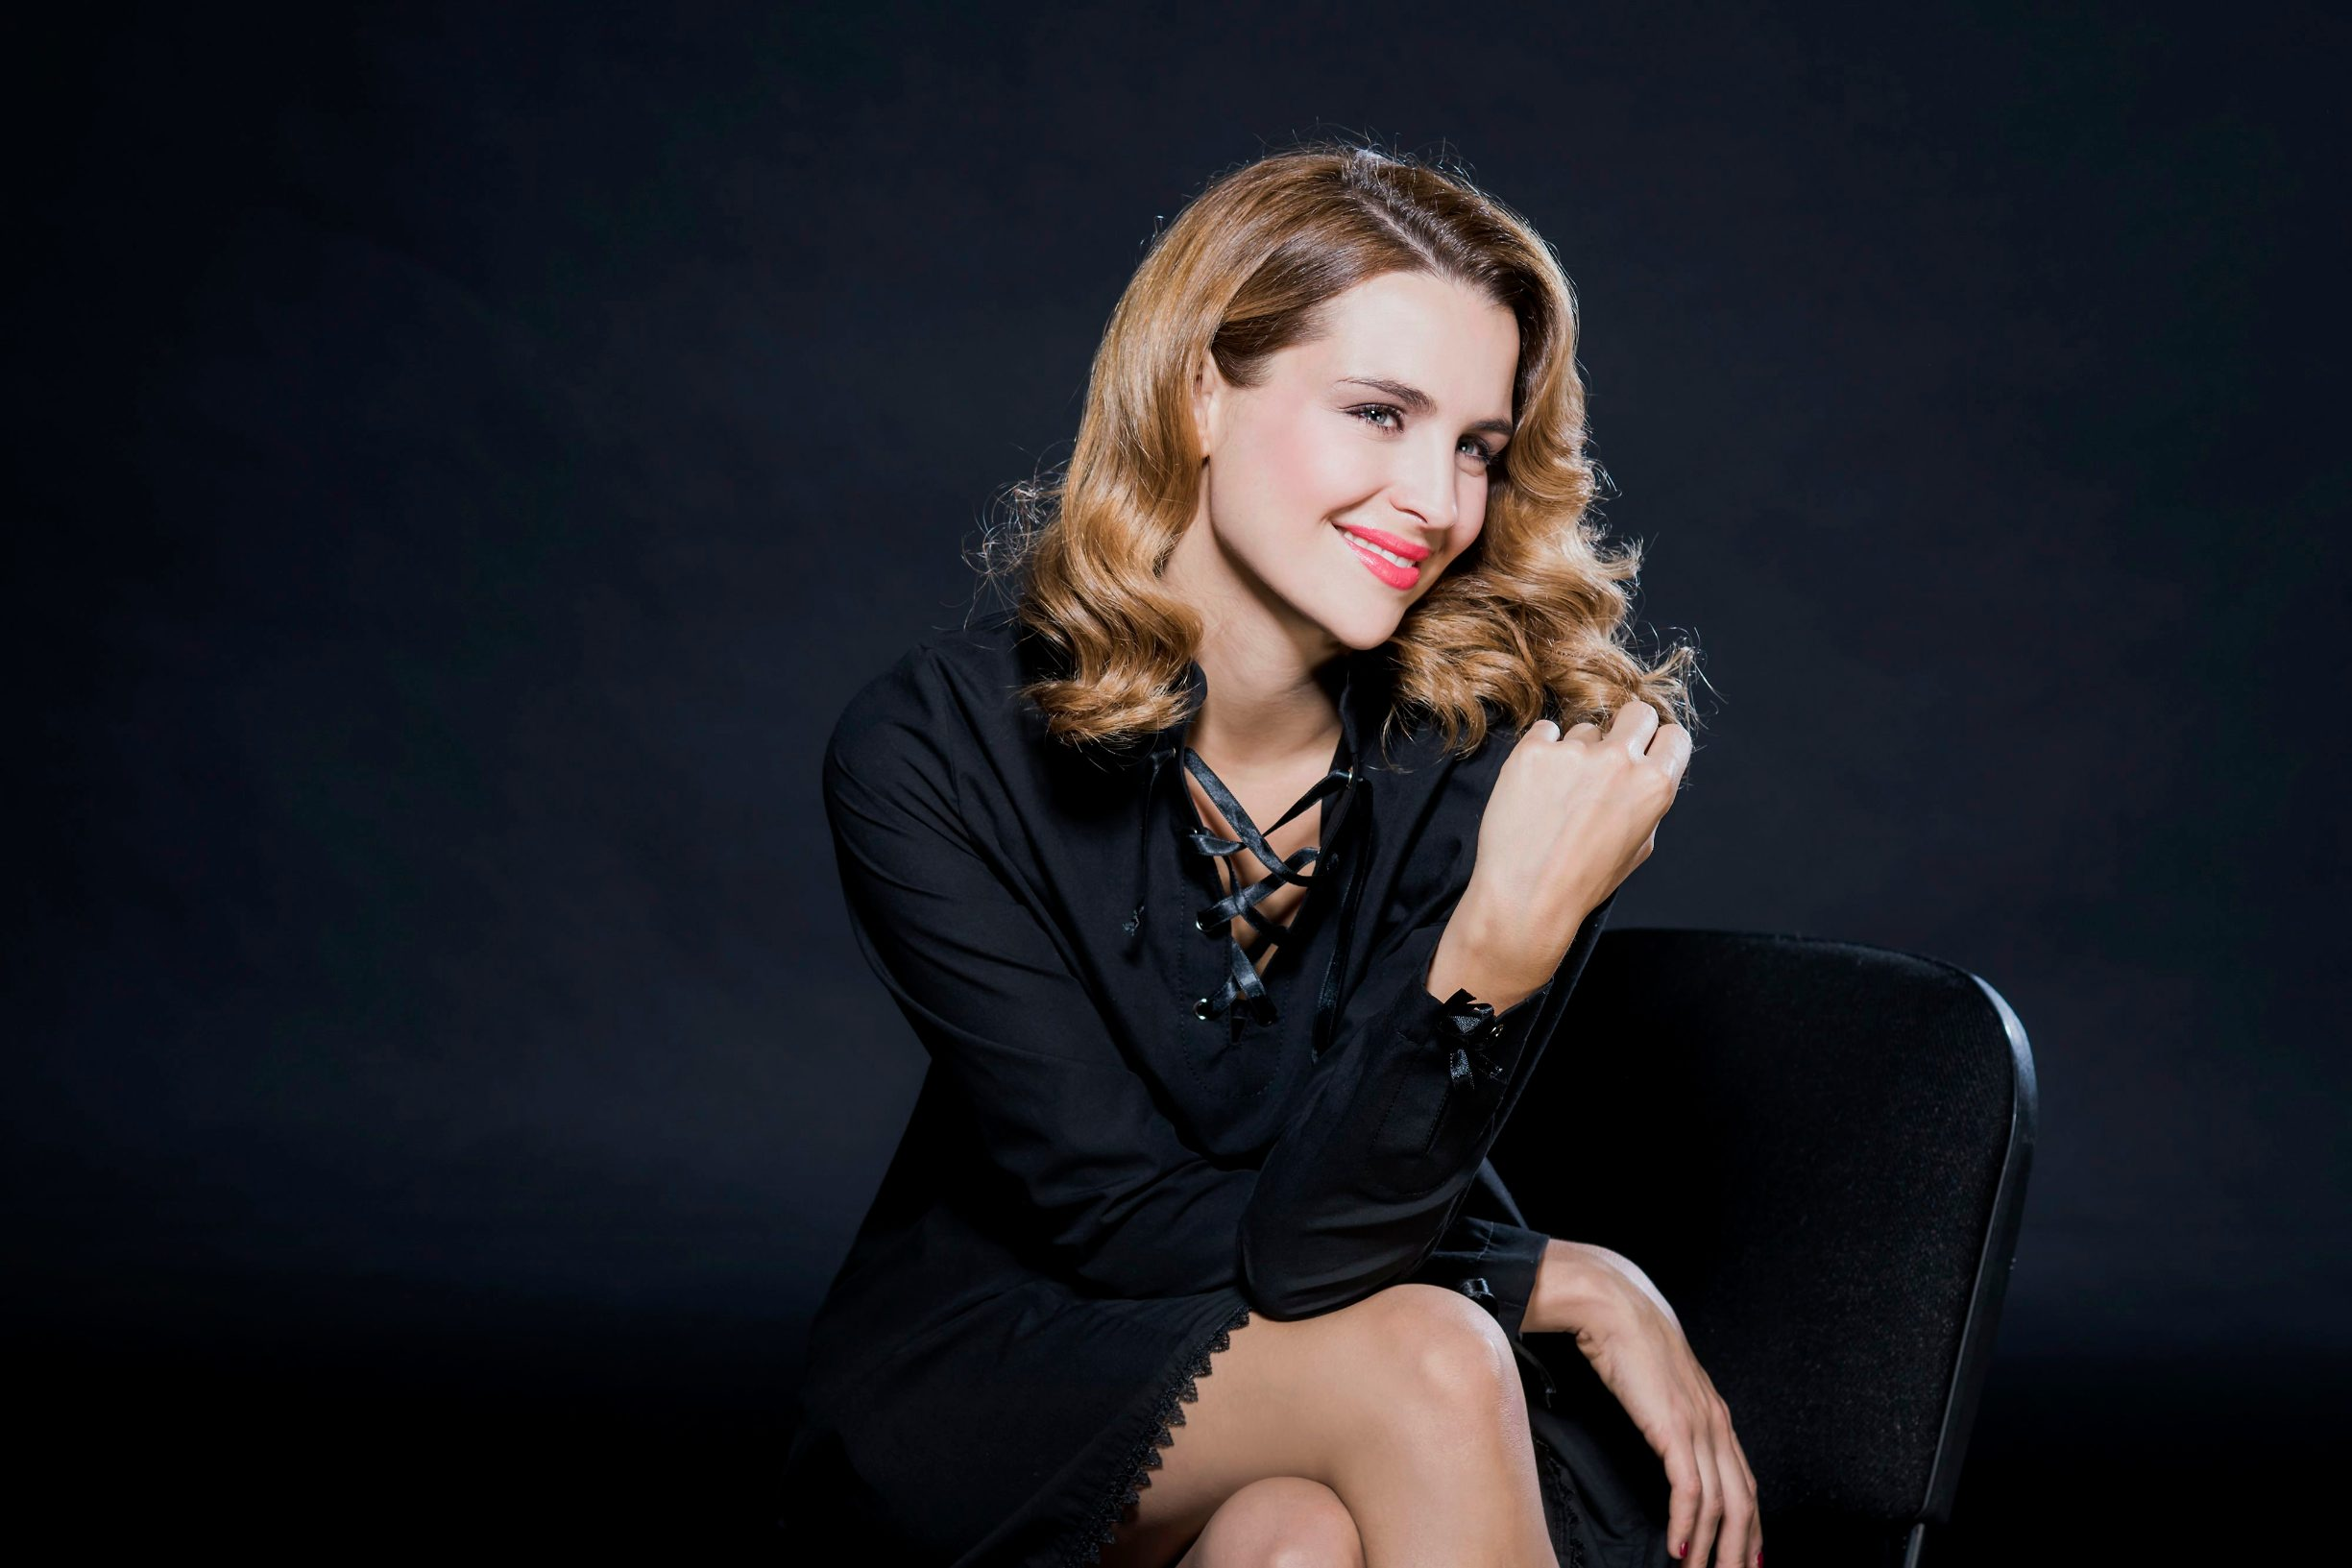 Zagreb, 211116.  Voditeljica i glumica Doris Pincic Rogoznica. Foto: Neja Markicevic / CROPIX